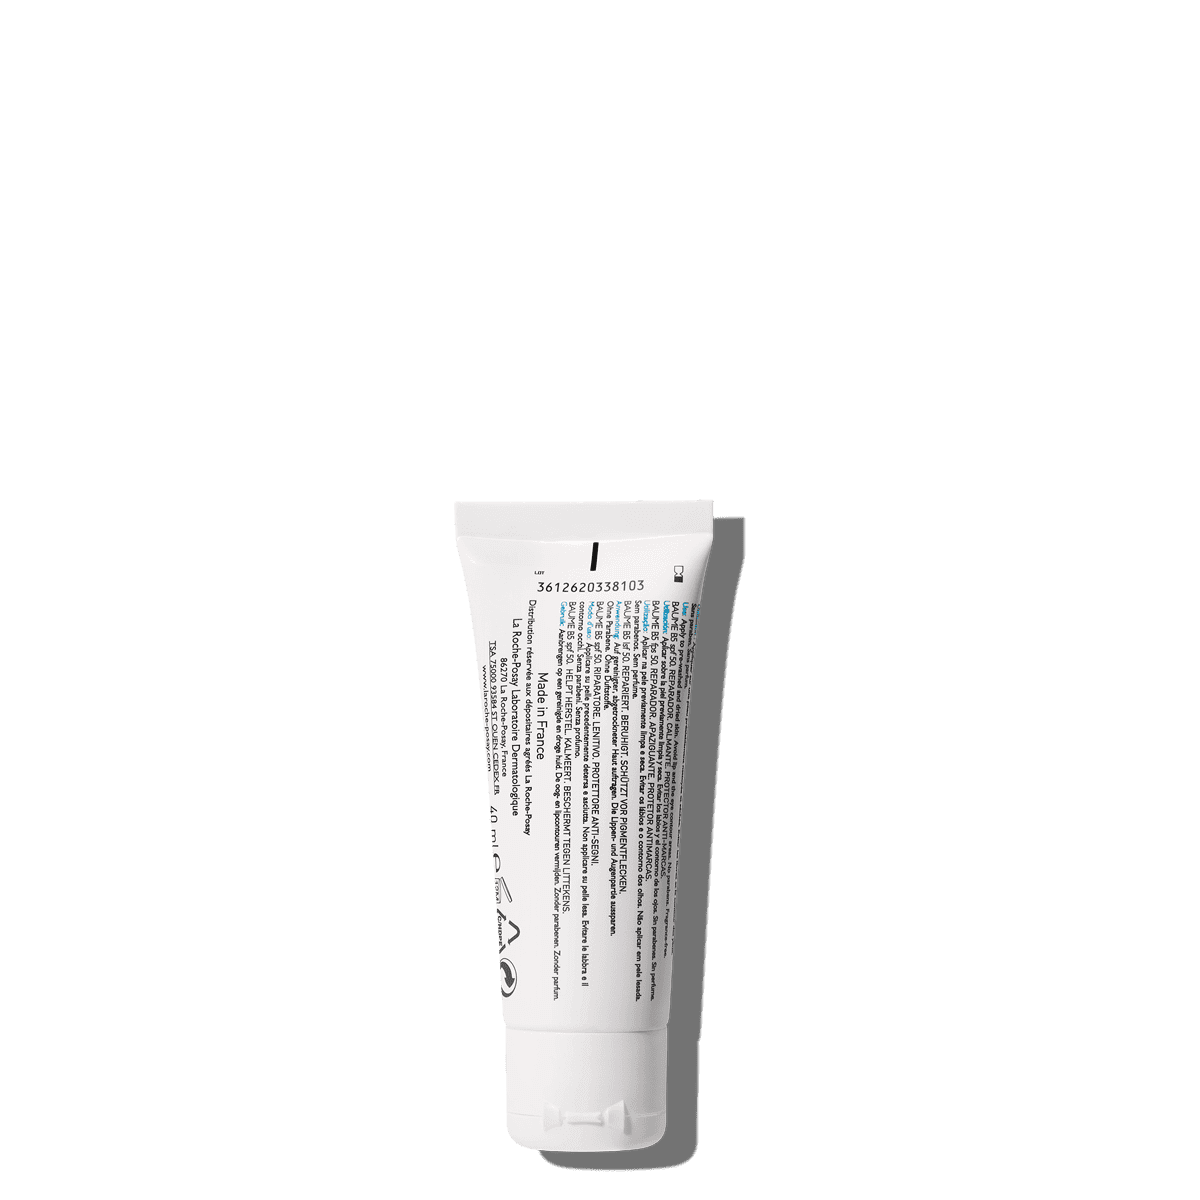 Cicaplast Baume B5 40 ml SPF 50 Tył | La Roche Posay